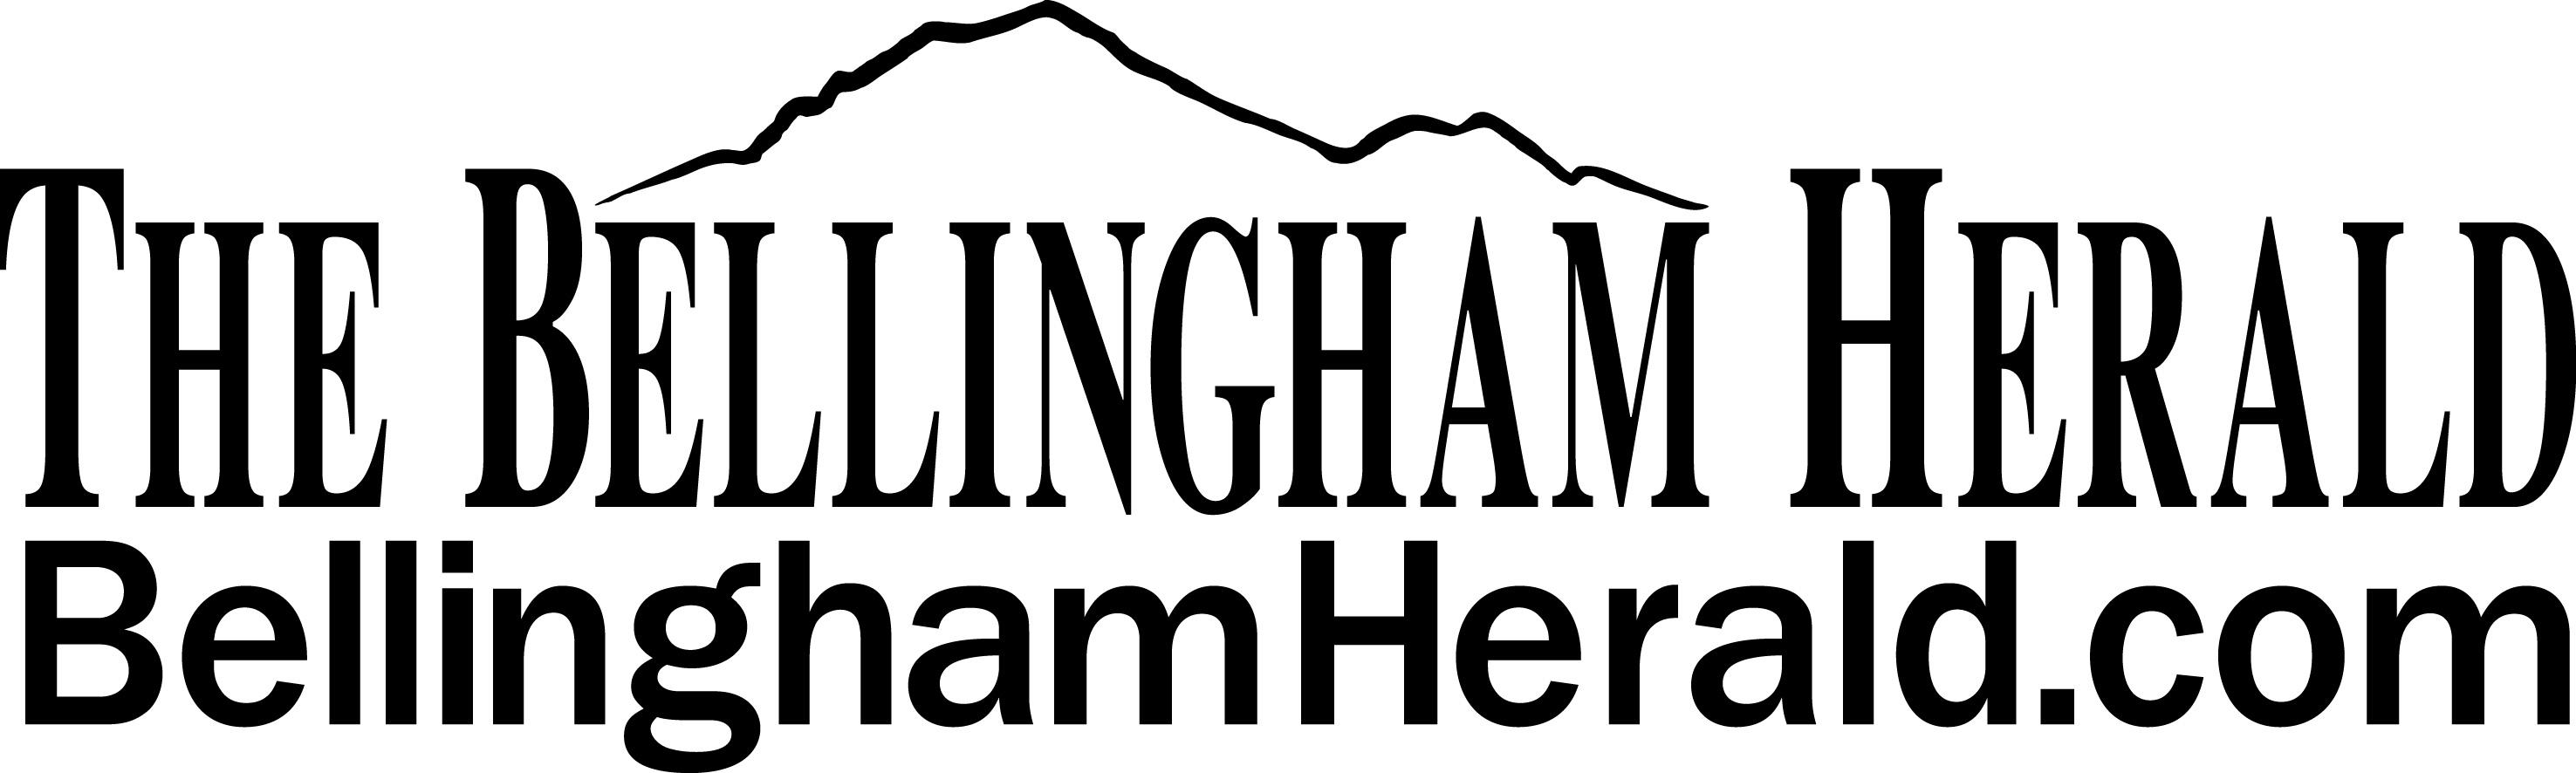 Bham Herald logo